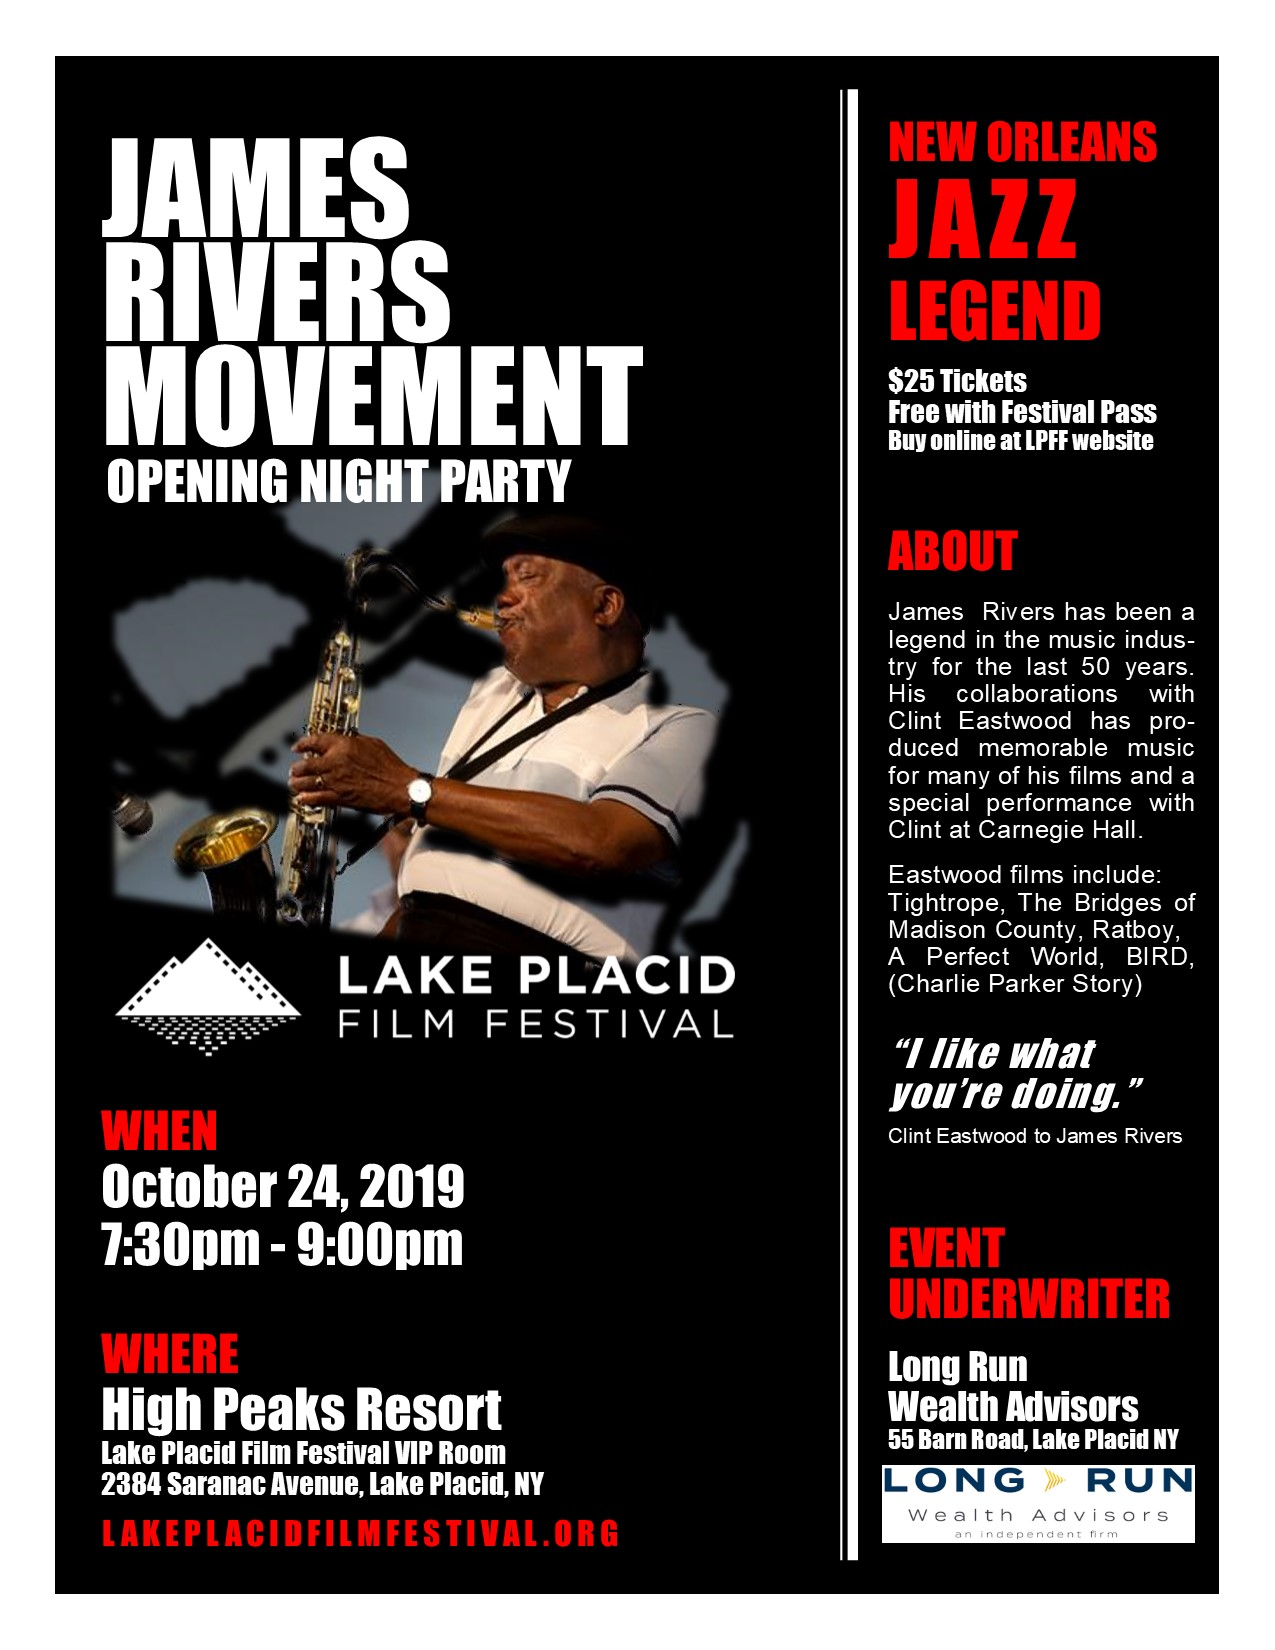 James Rivers Movement Poster 8.5x11 Final.jpg